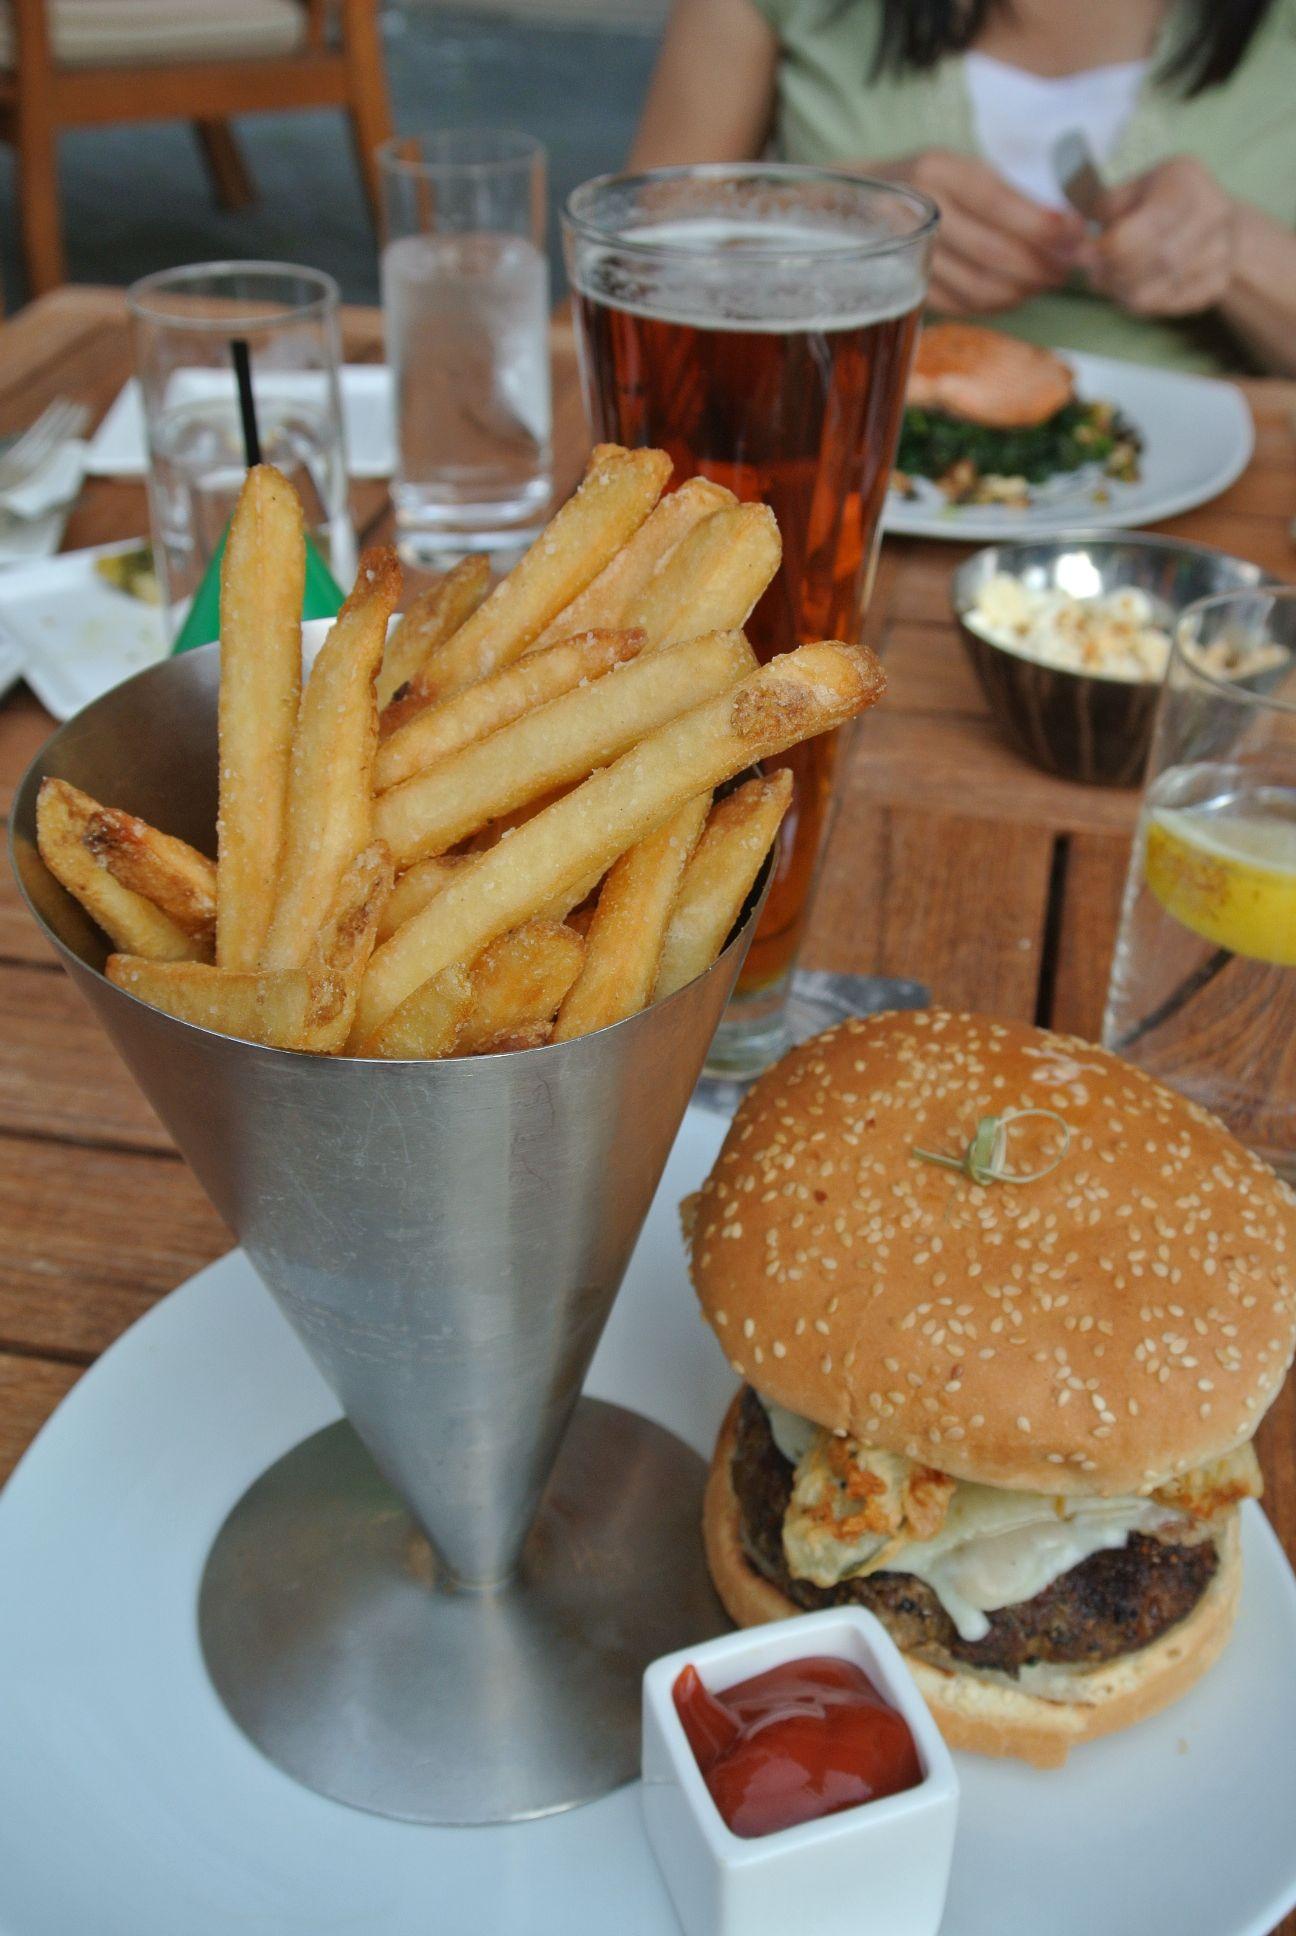 Fifty Two Eighty Four Seasons Whistler - 8oz. Kobe Style Burger, Pepper Jack Cheese, Onion, Bacon Jam, Heirloom Tomato, 'dd'pickle, Secret Sauce, Sesame Kaiser Bun